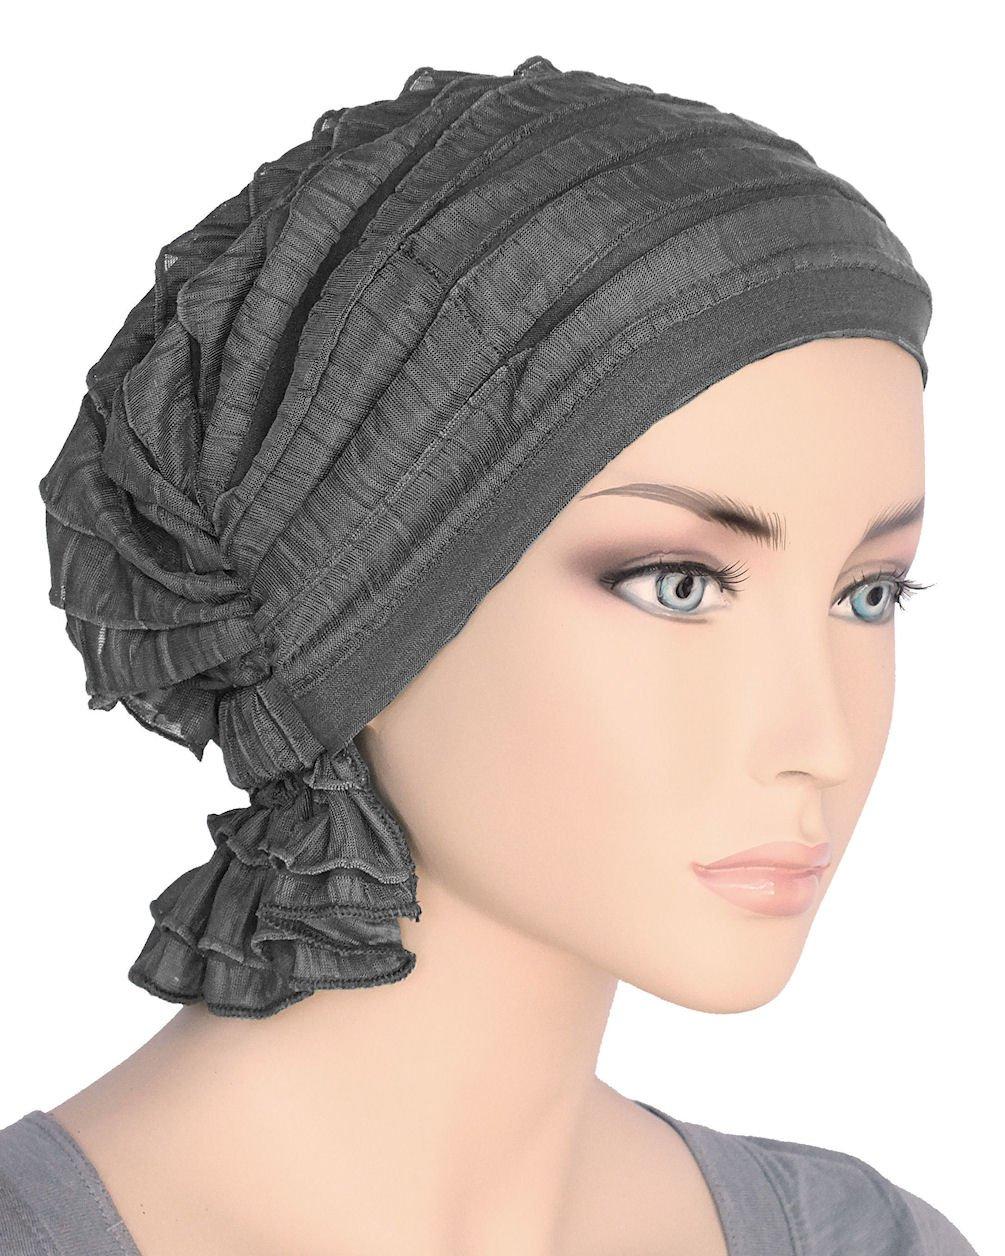 Abbey Cap Womens Chemo Hat Beanie Scarf Turban Headwear for Cancer Ruffle Charcoal Gray